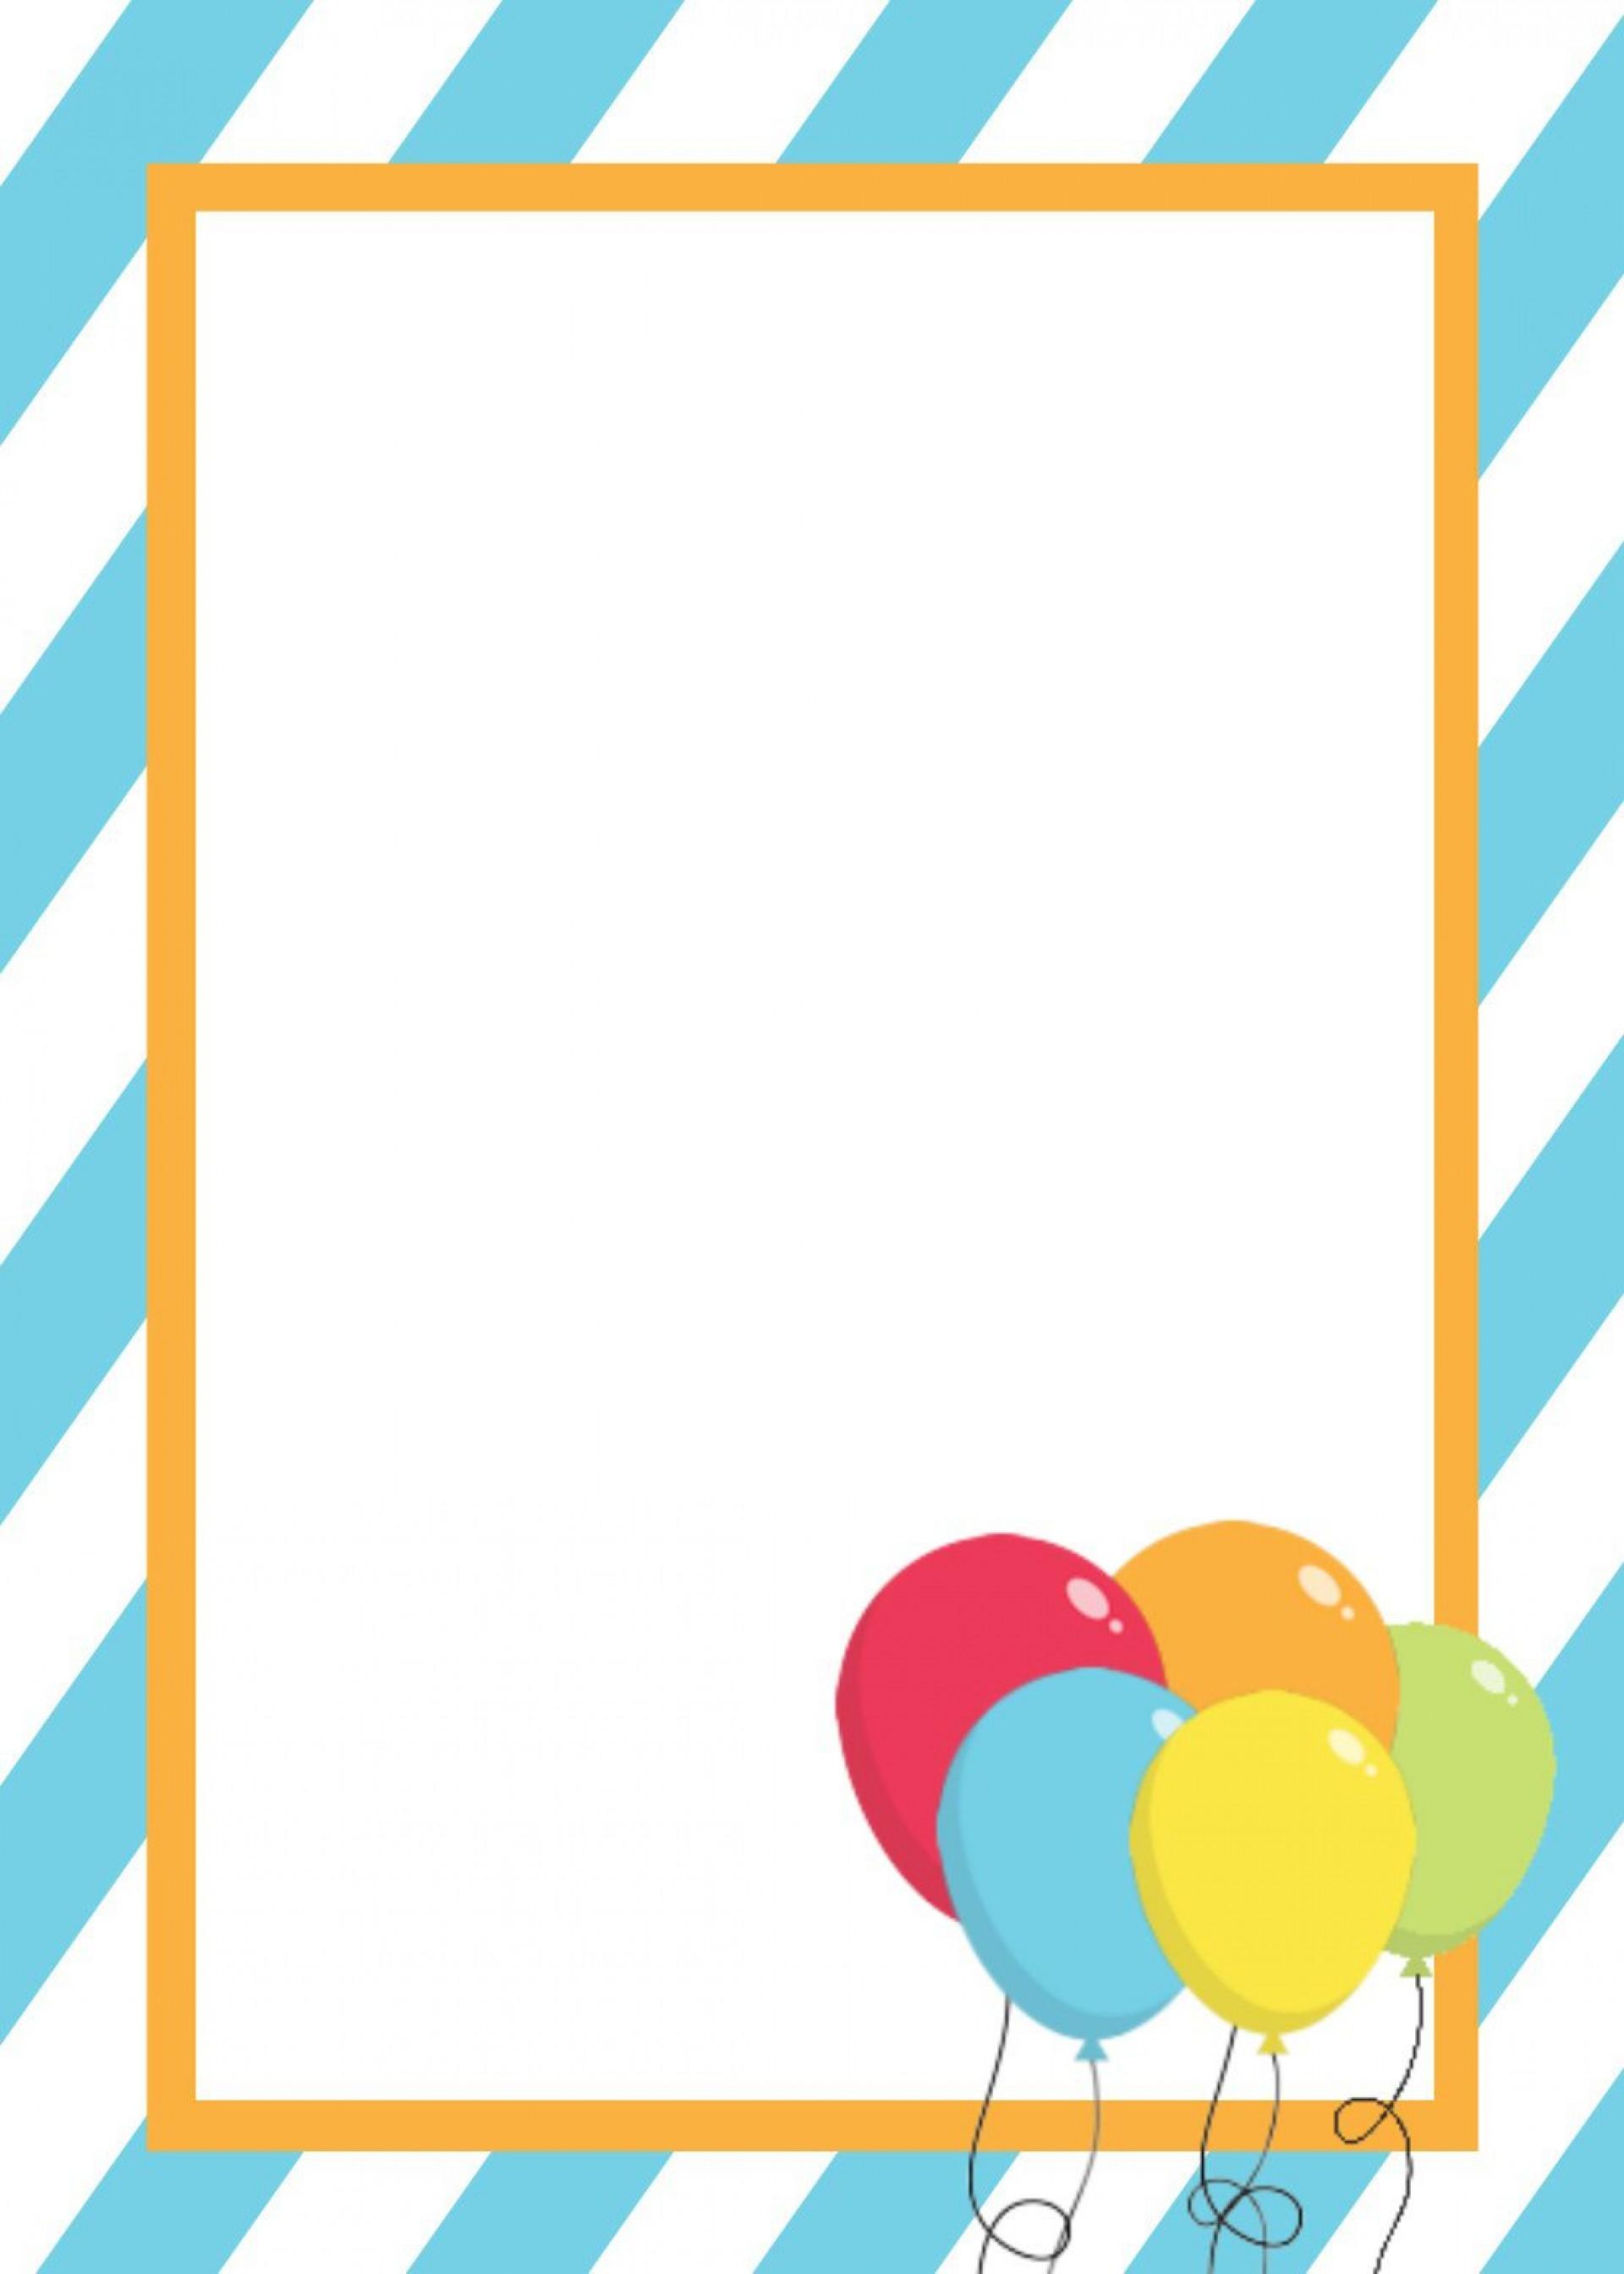 007 Frightening Birthday Party Invitation Template Word Free Idea  Download Invite1920